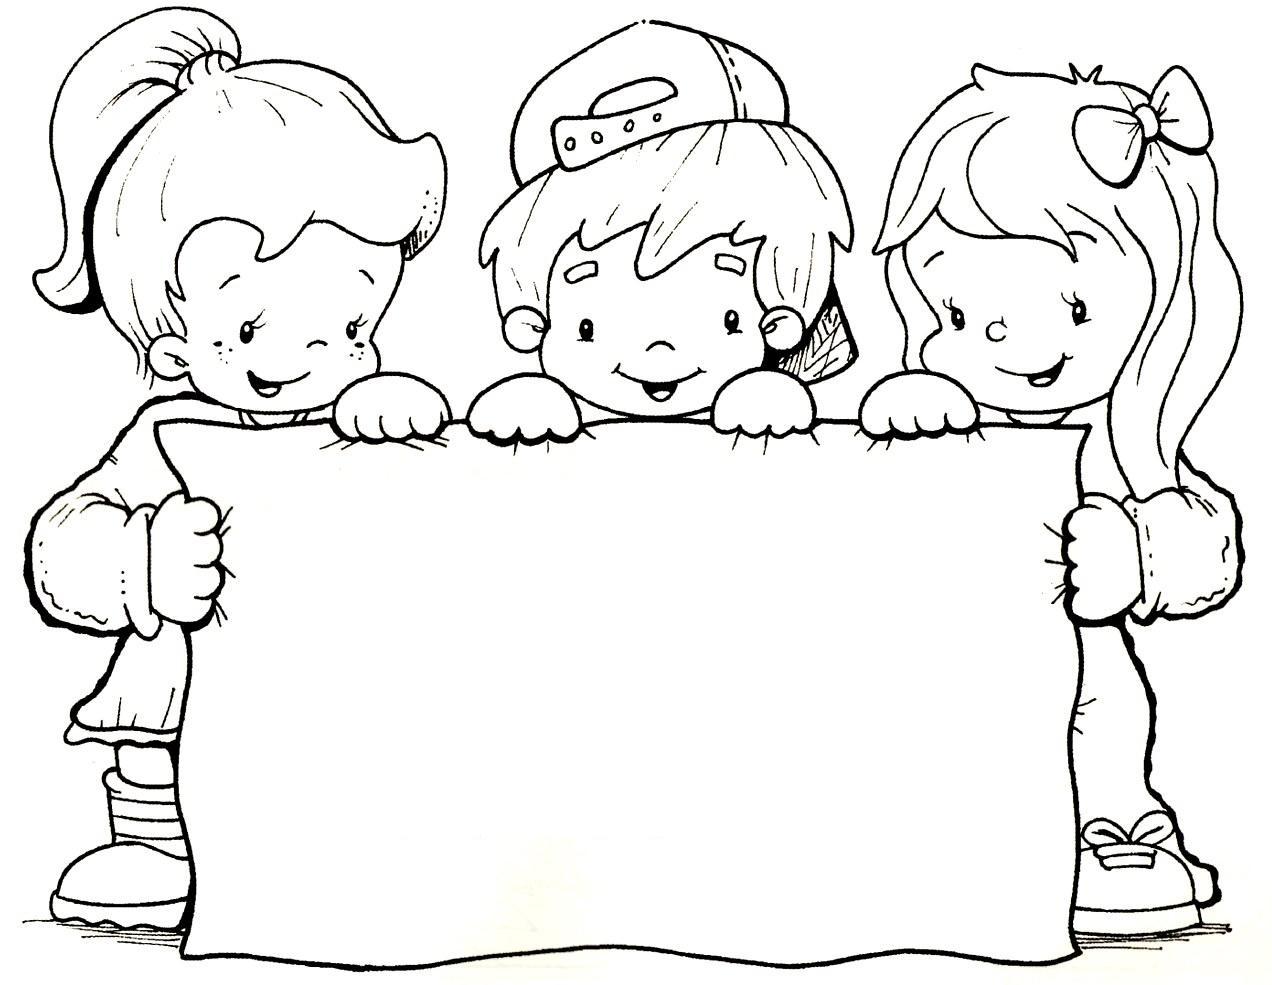 Dibujos Para Imprimir Para Ninos